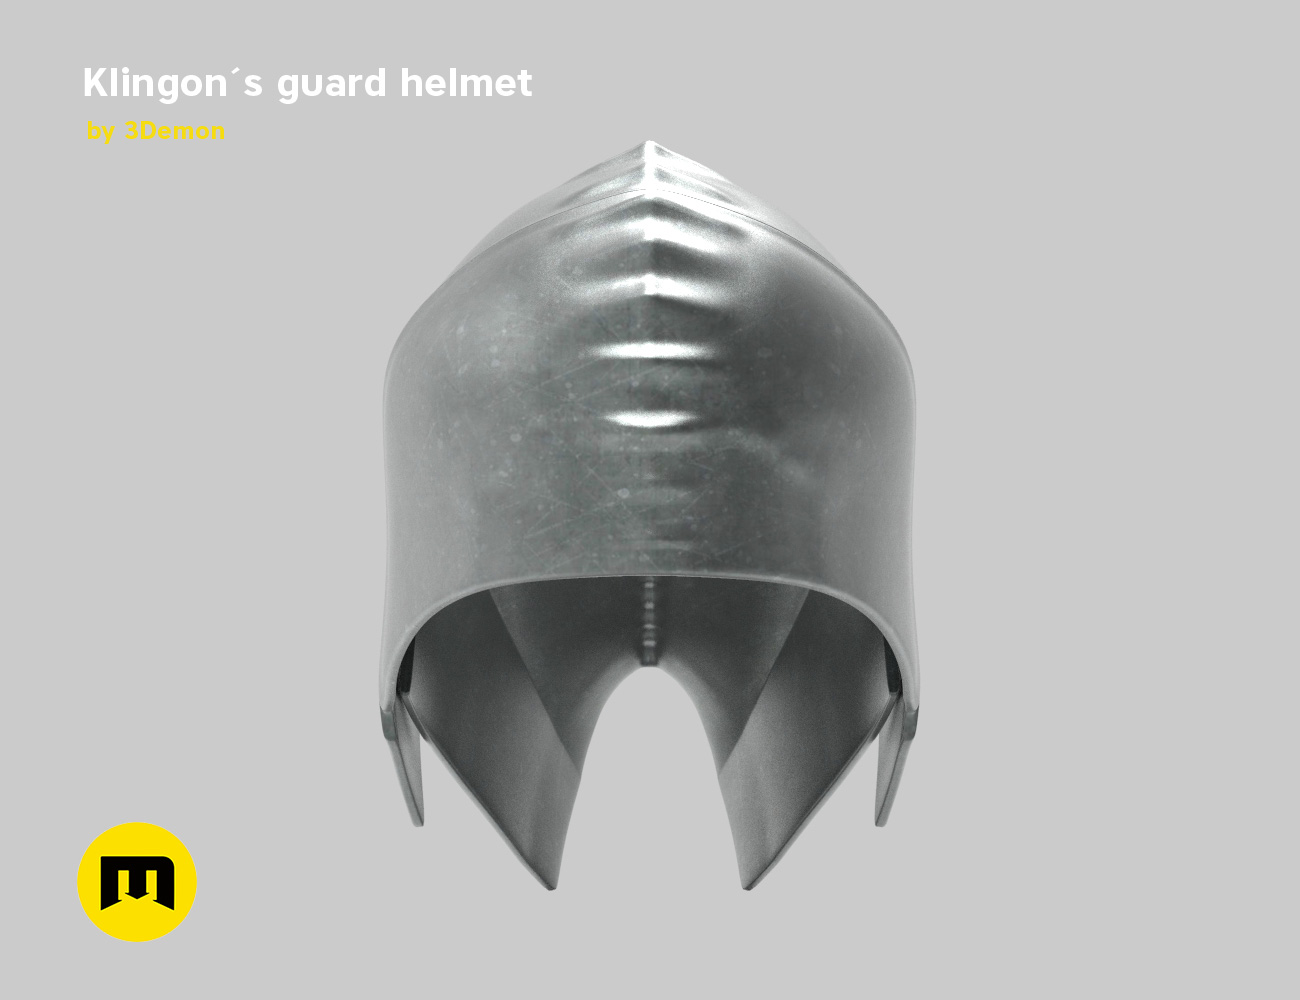 render_klingon_color.52.jpg Download STL file Klingon guard helmet • 3D printer object, 3D-mon